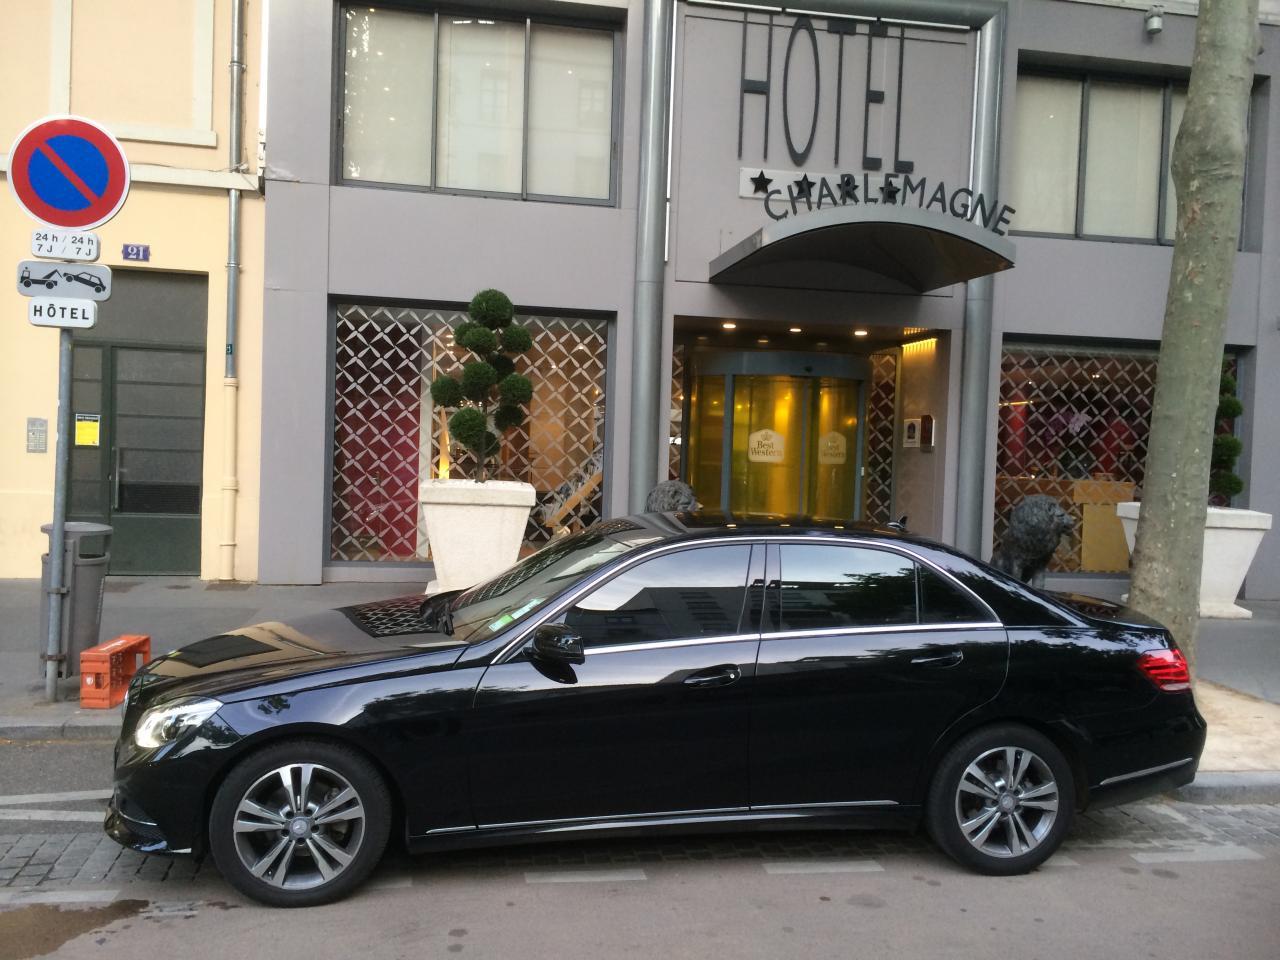 transfert Hôtel Charlemagne Lyon